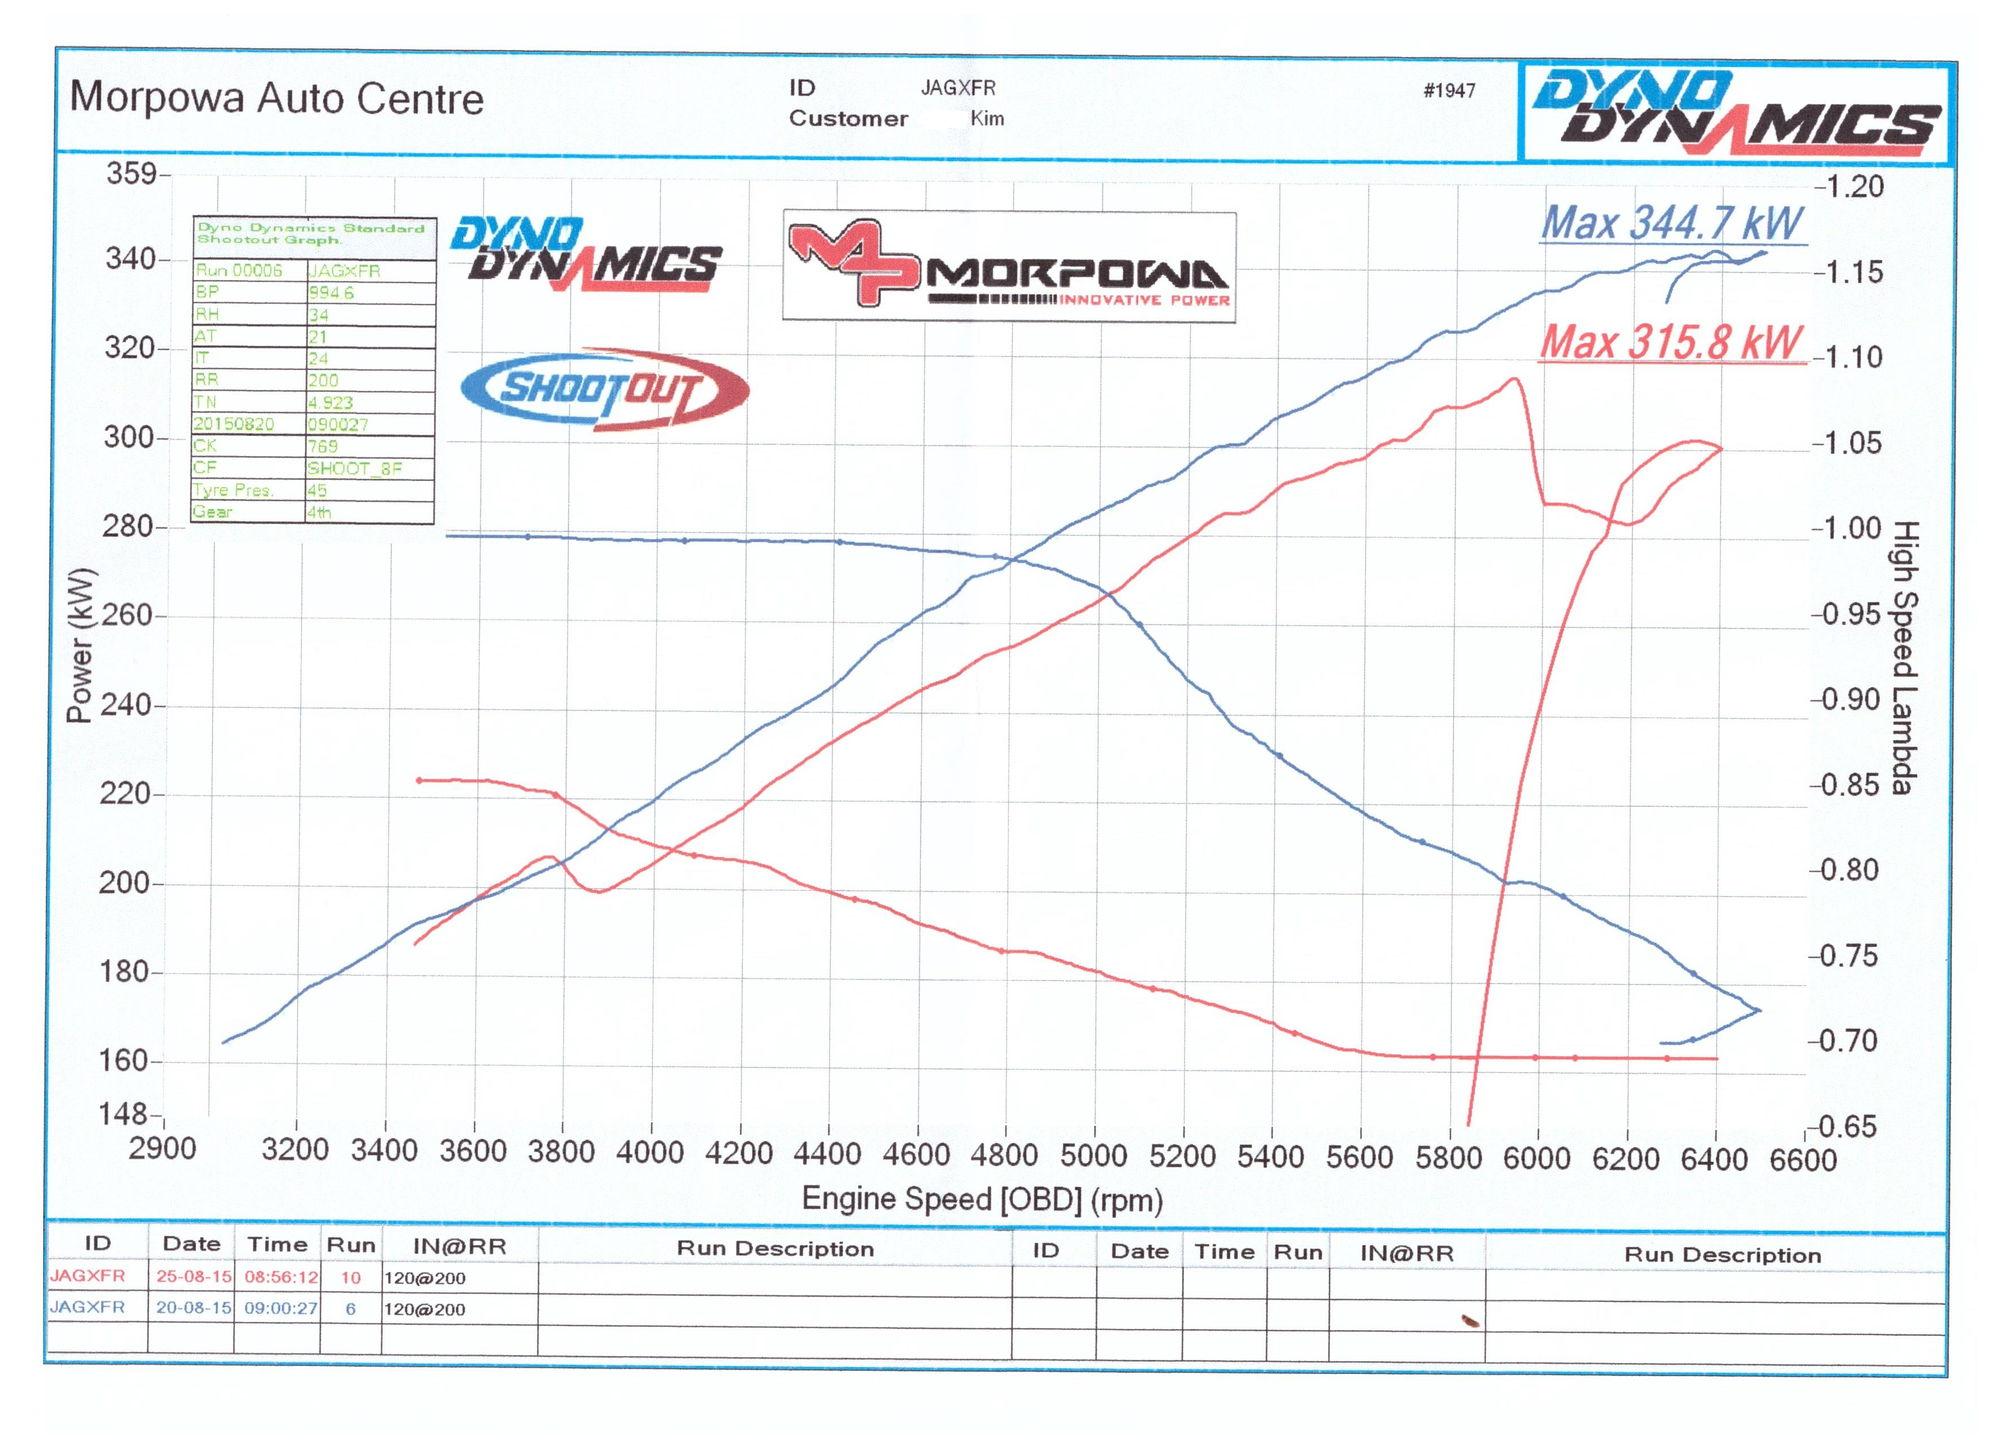 80 xfr_dyno_post_tune_1_bca91510017d00fbb963d2c6b97e282f32bef5ee fl70 mins wiring diagram impulse brake controller wiring diagram 95 freightliner fl70 fuse box diagram at suagrazia.org